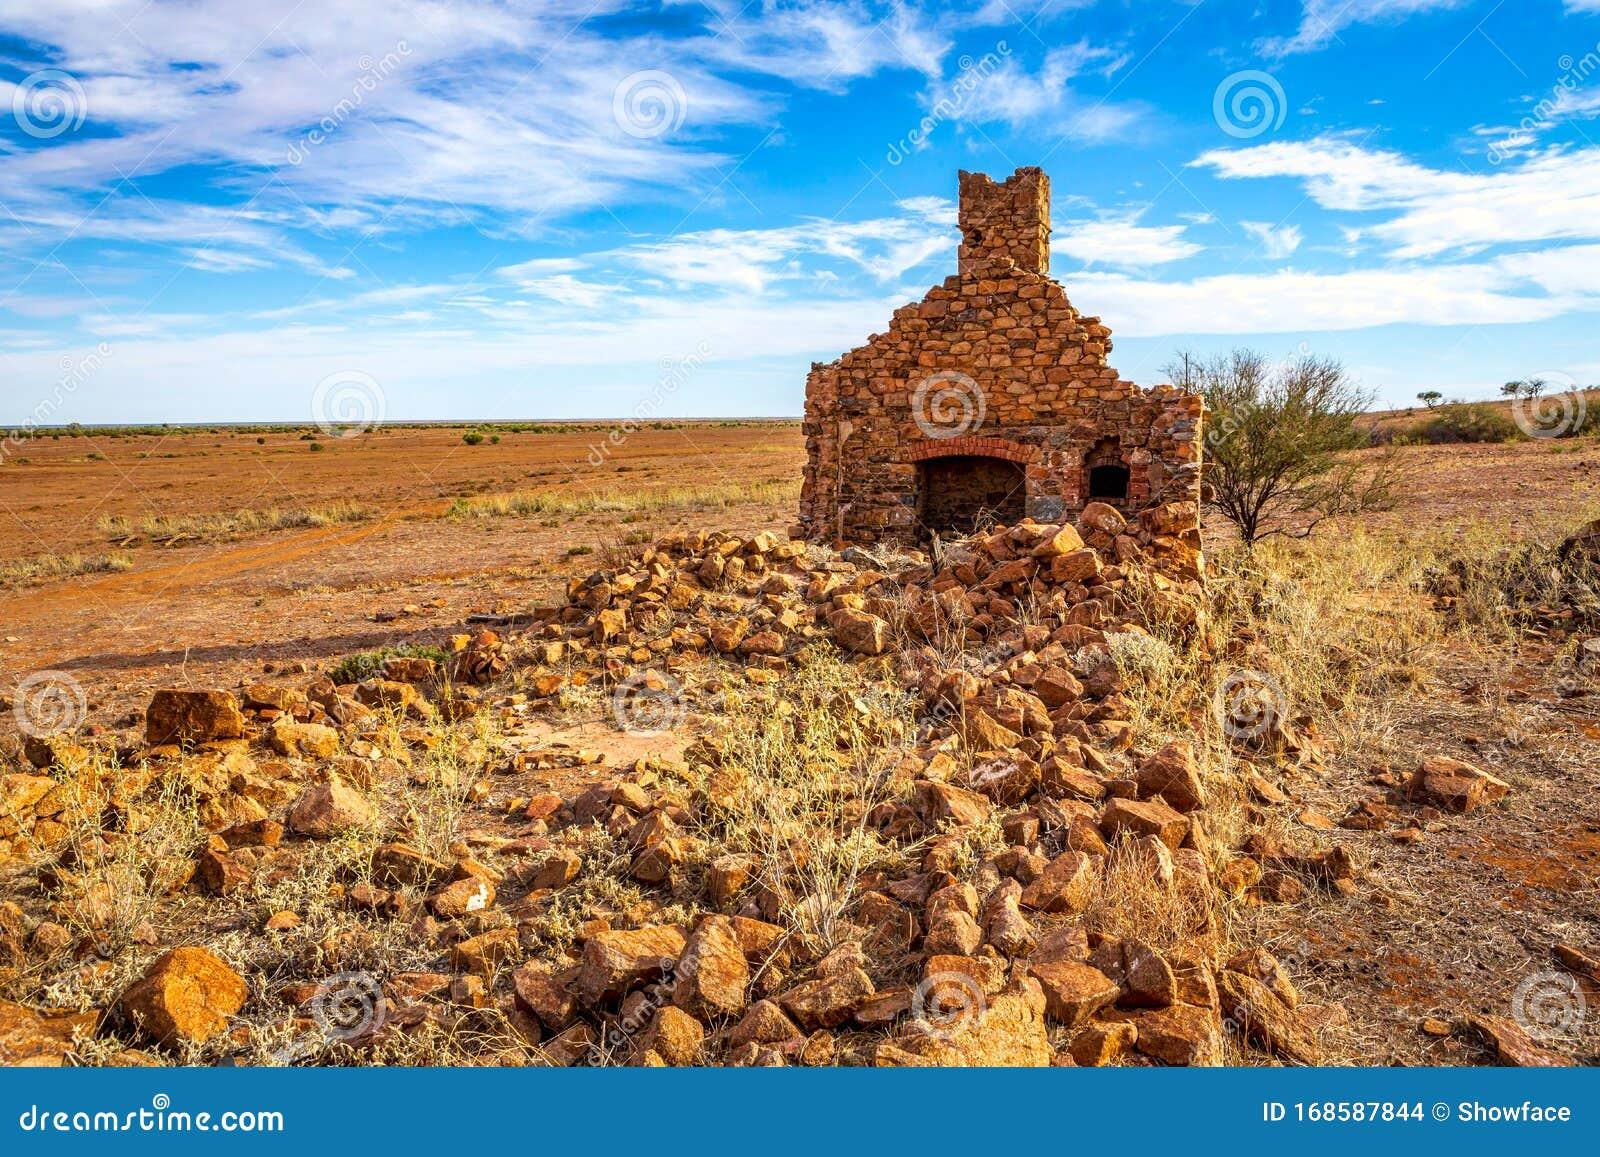 6 095 Stone Farmhouse Photos Free Royalty Free Stock Photos From Dreamstime